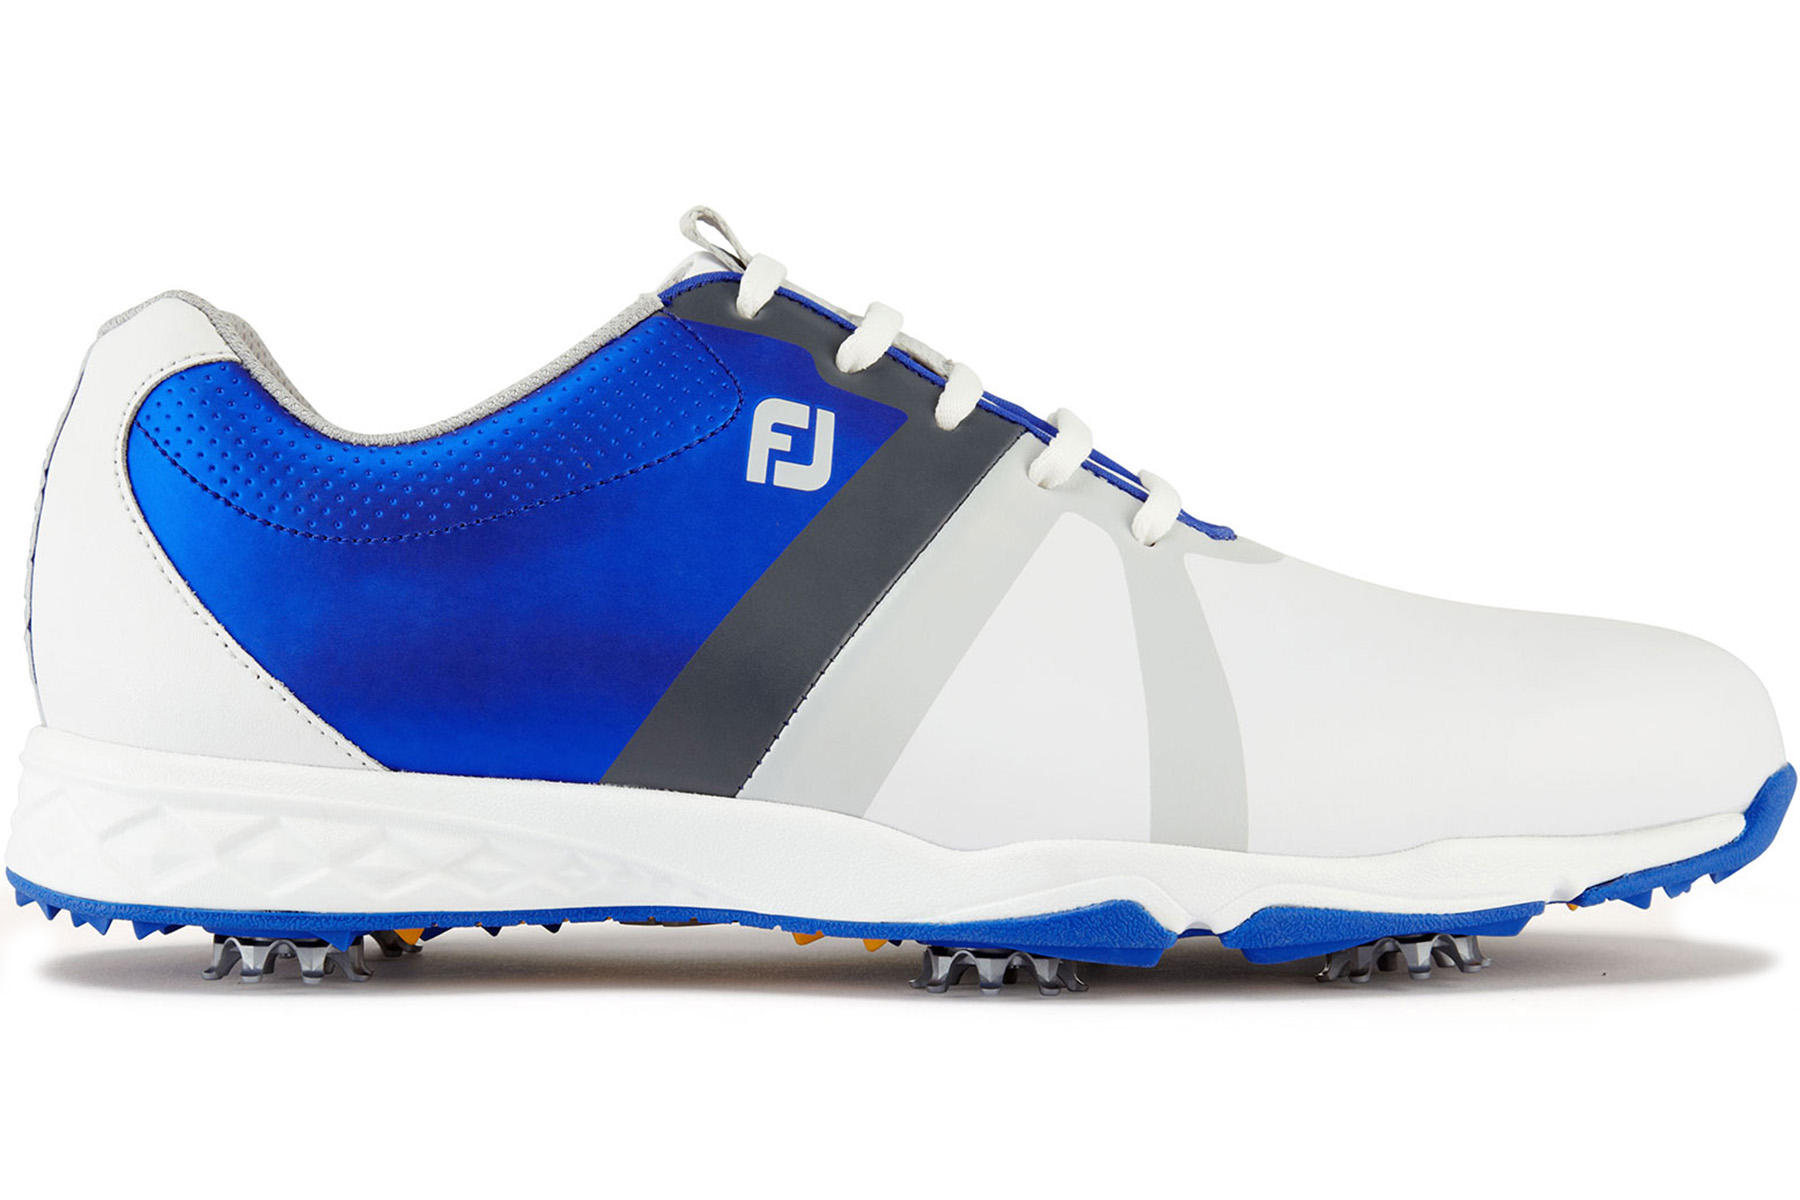 American Golf Footjoy Shoes